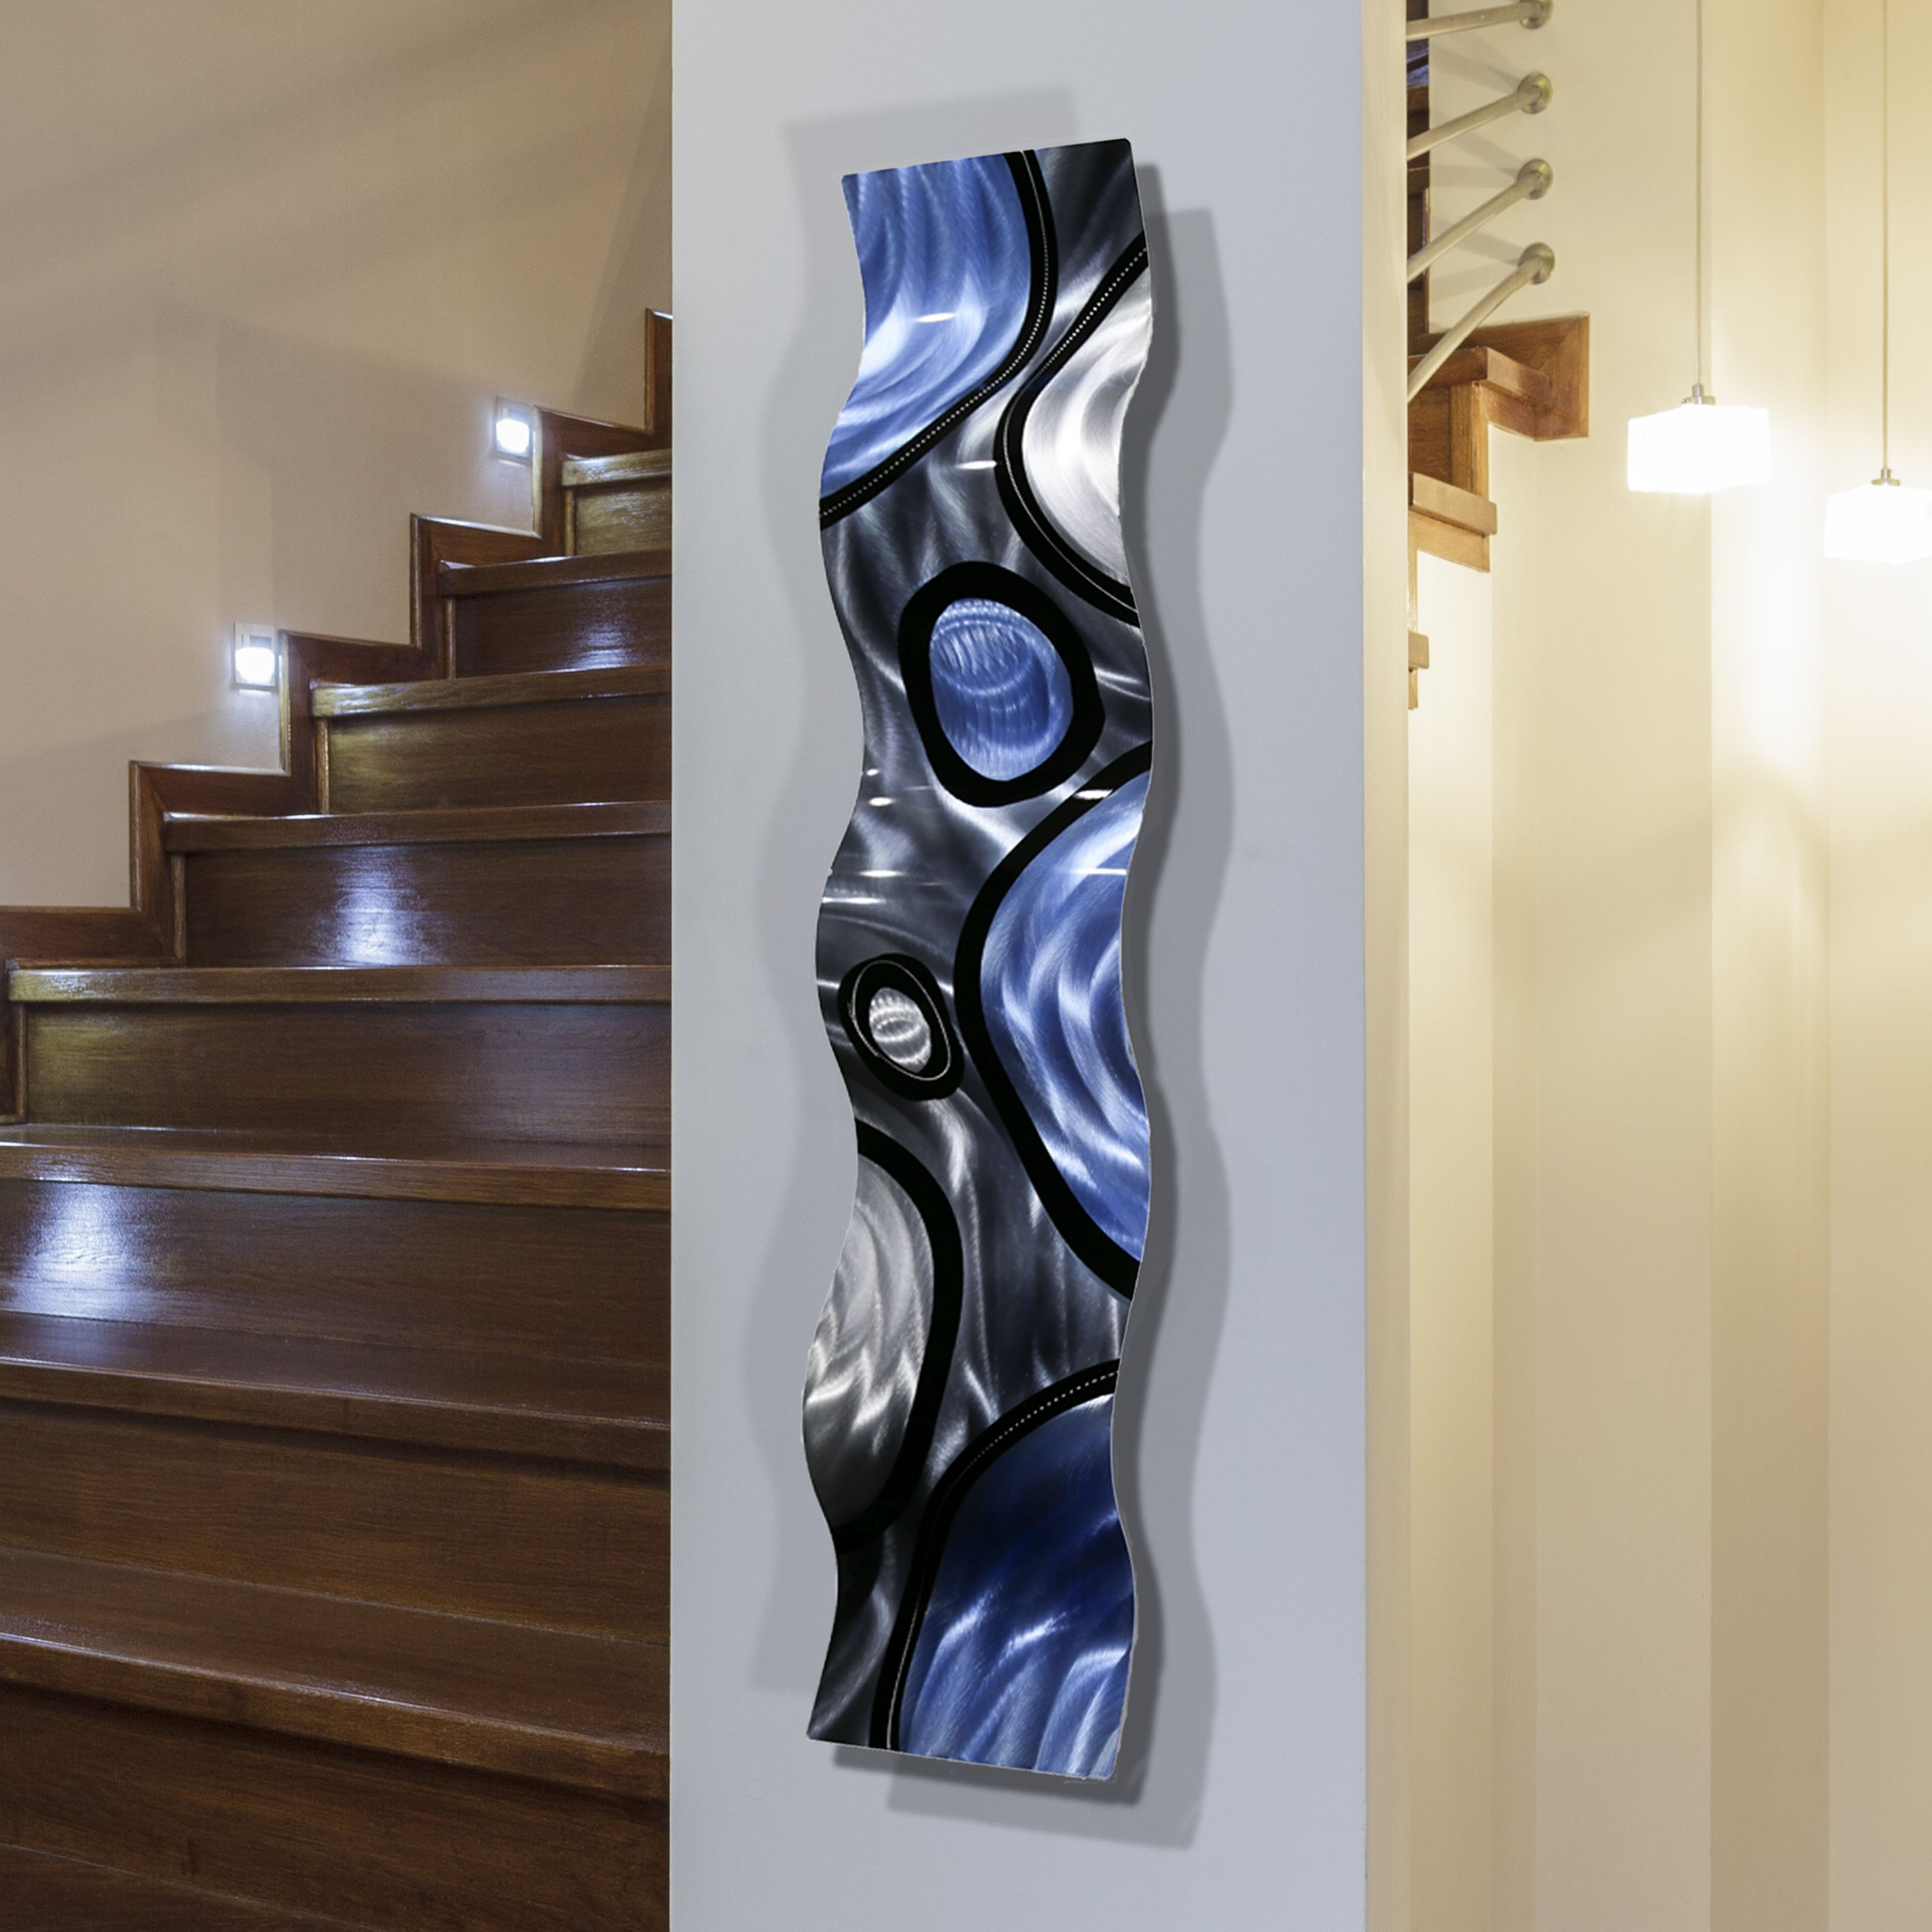 Shop Statements2000 Modern Abstract Metal Wall Art Accent Sculpture Decor By Jon Allen Large Pattern Wave Overstock 12456045